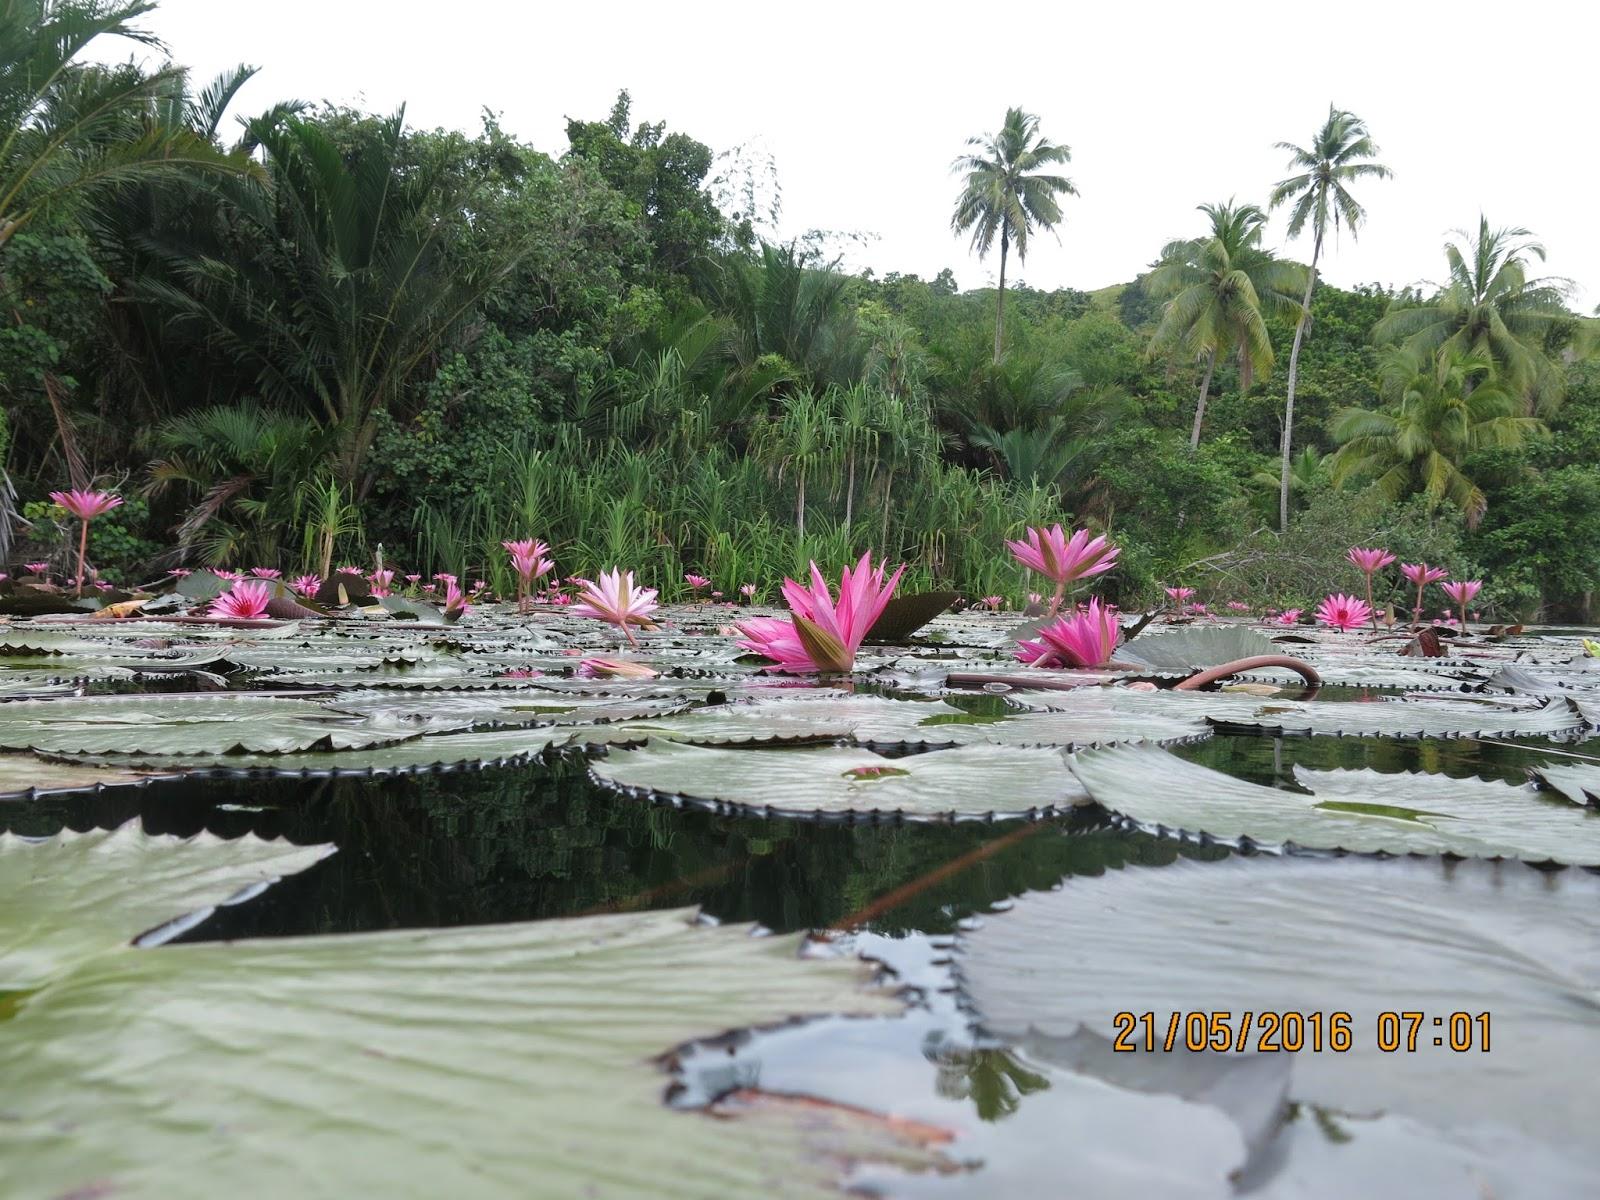 Memancing Jayapura 01 Danau Sentani Luas Gampang Susah Umpan Nasi